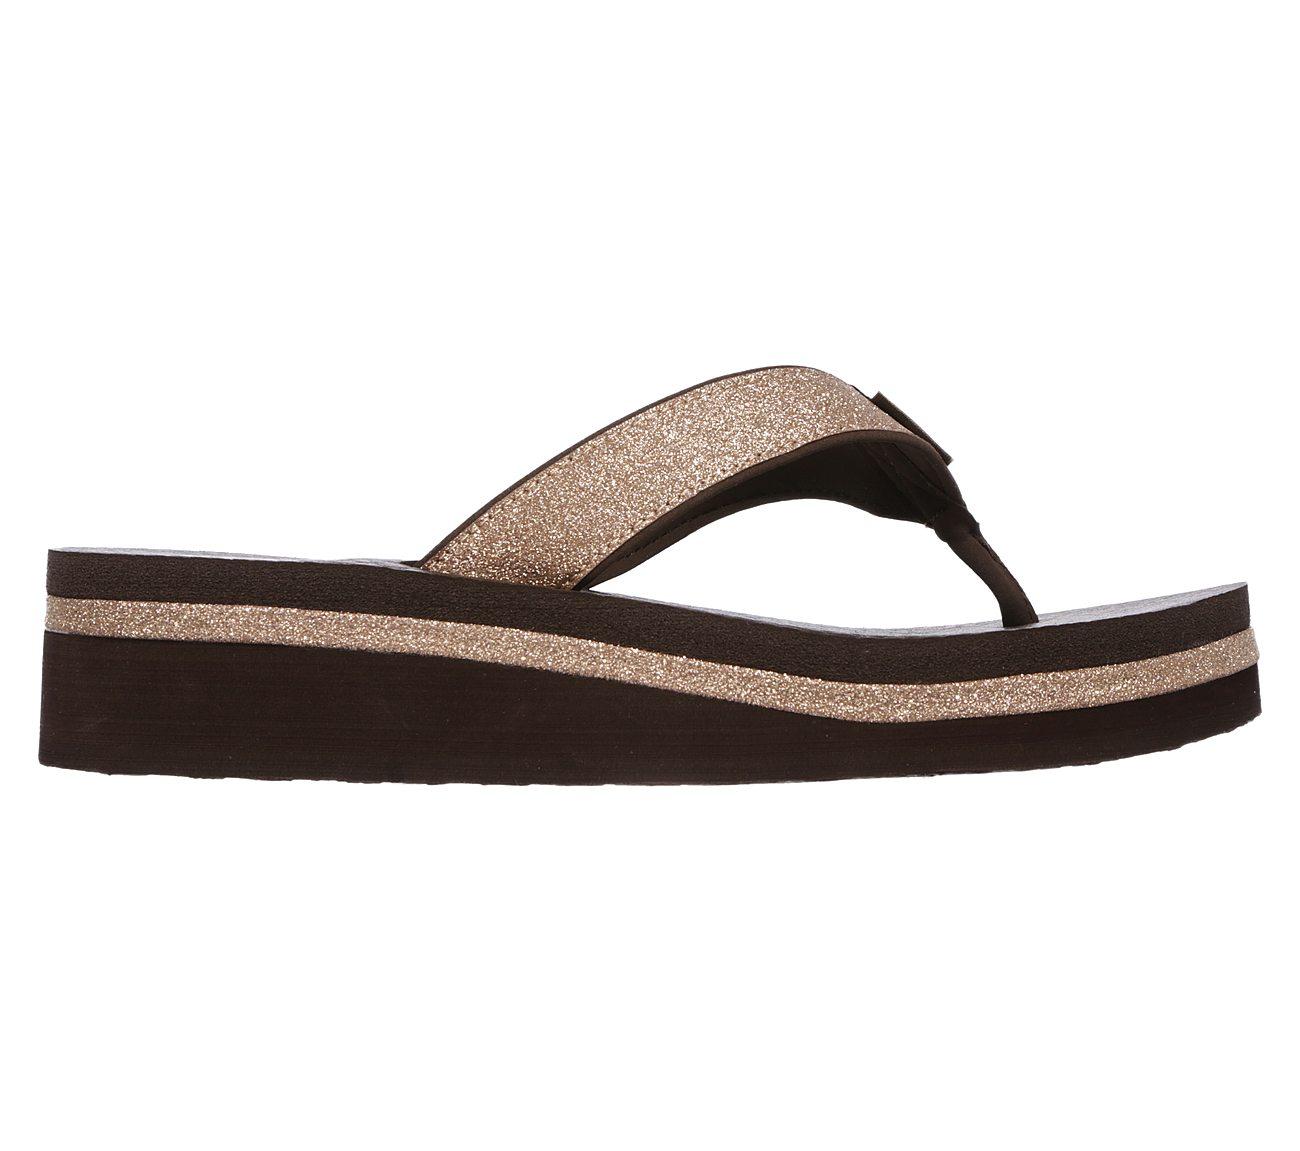 Buy SKECHERS SKECHERS SKECHERS Vinyasa Unicorn Mist Cali Schuhes only 40.00 6a7767